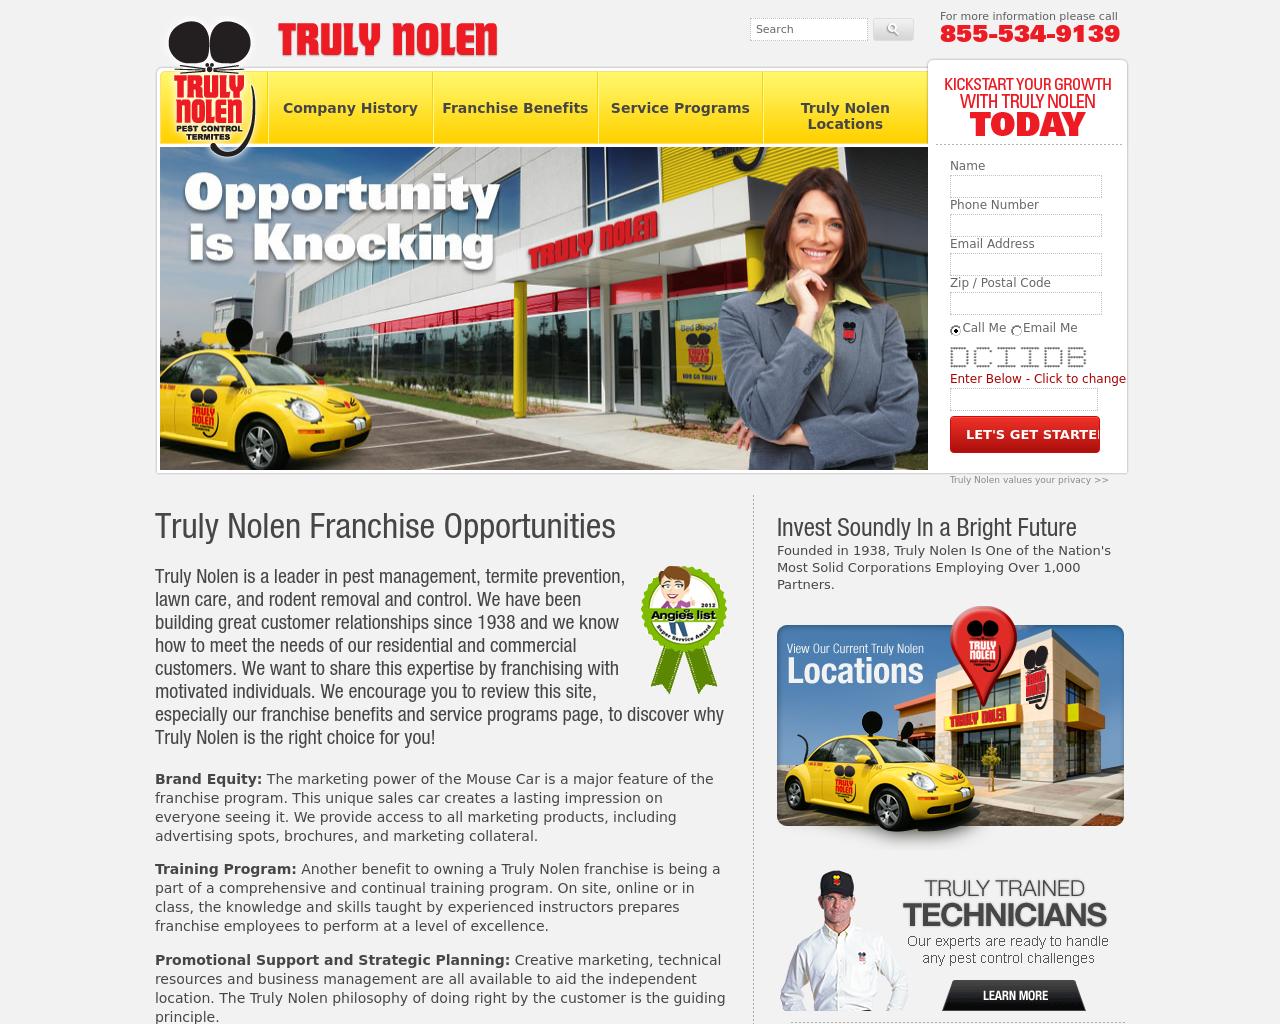 Truly-Nolen-Advertising-Reviews-Pricing